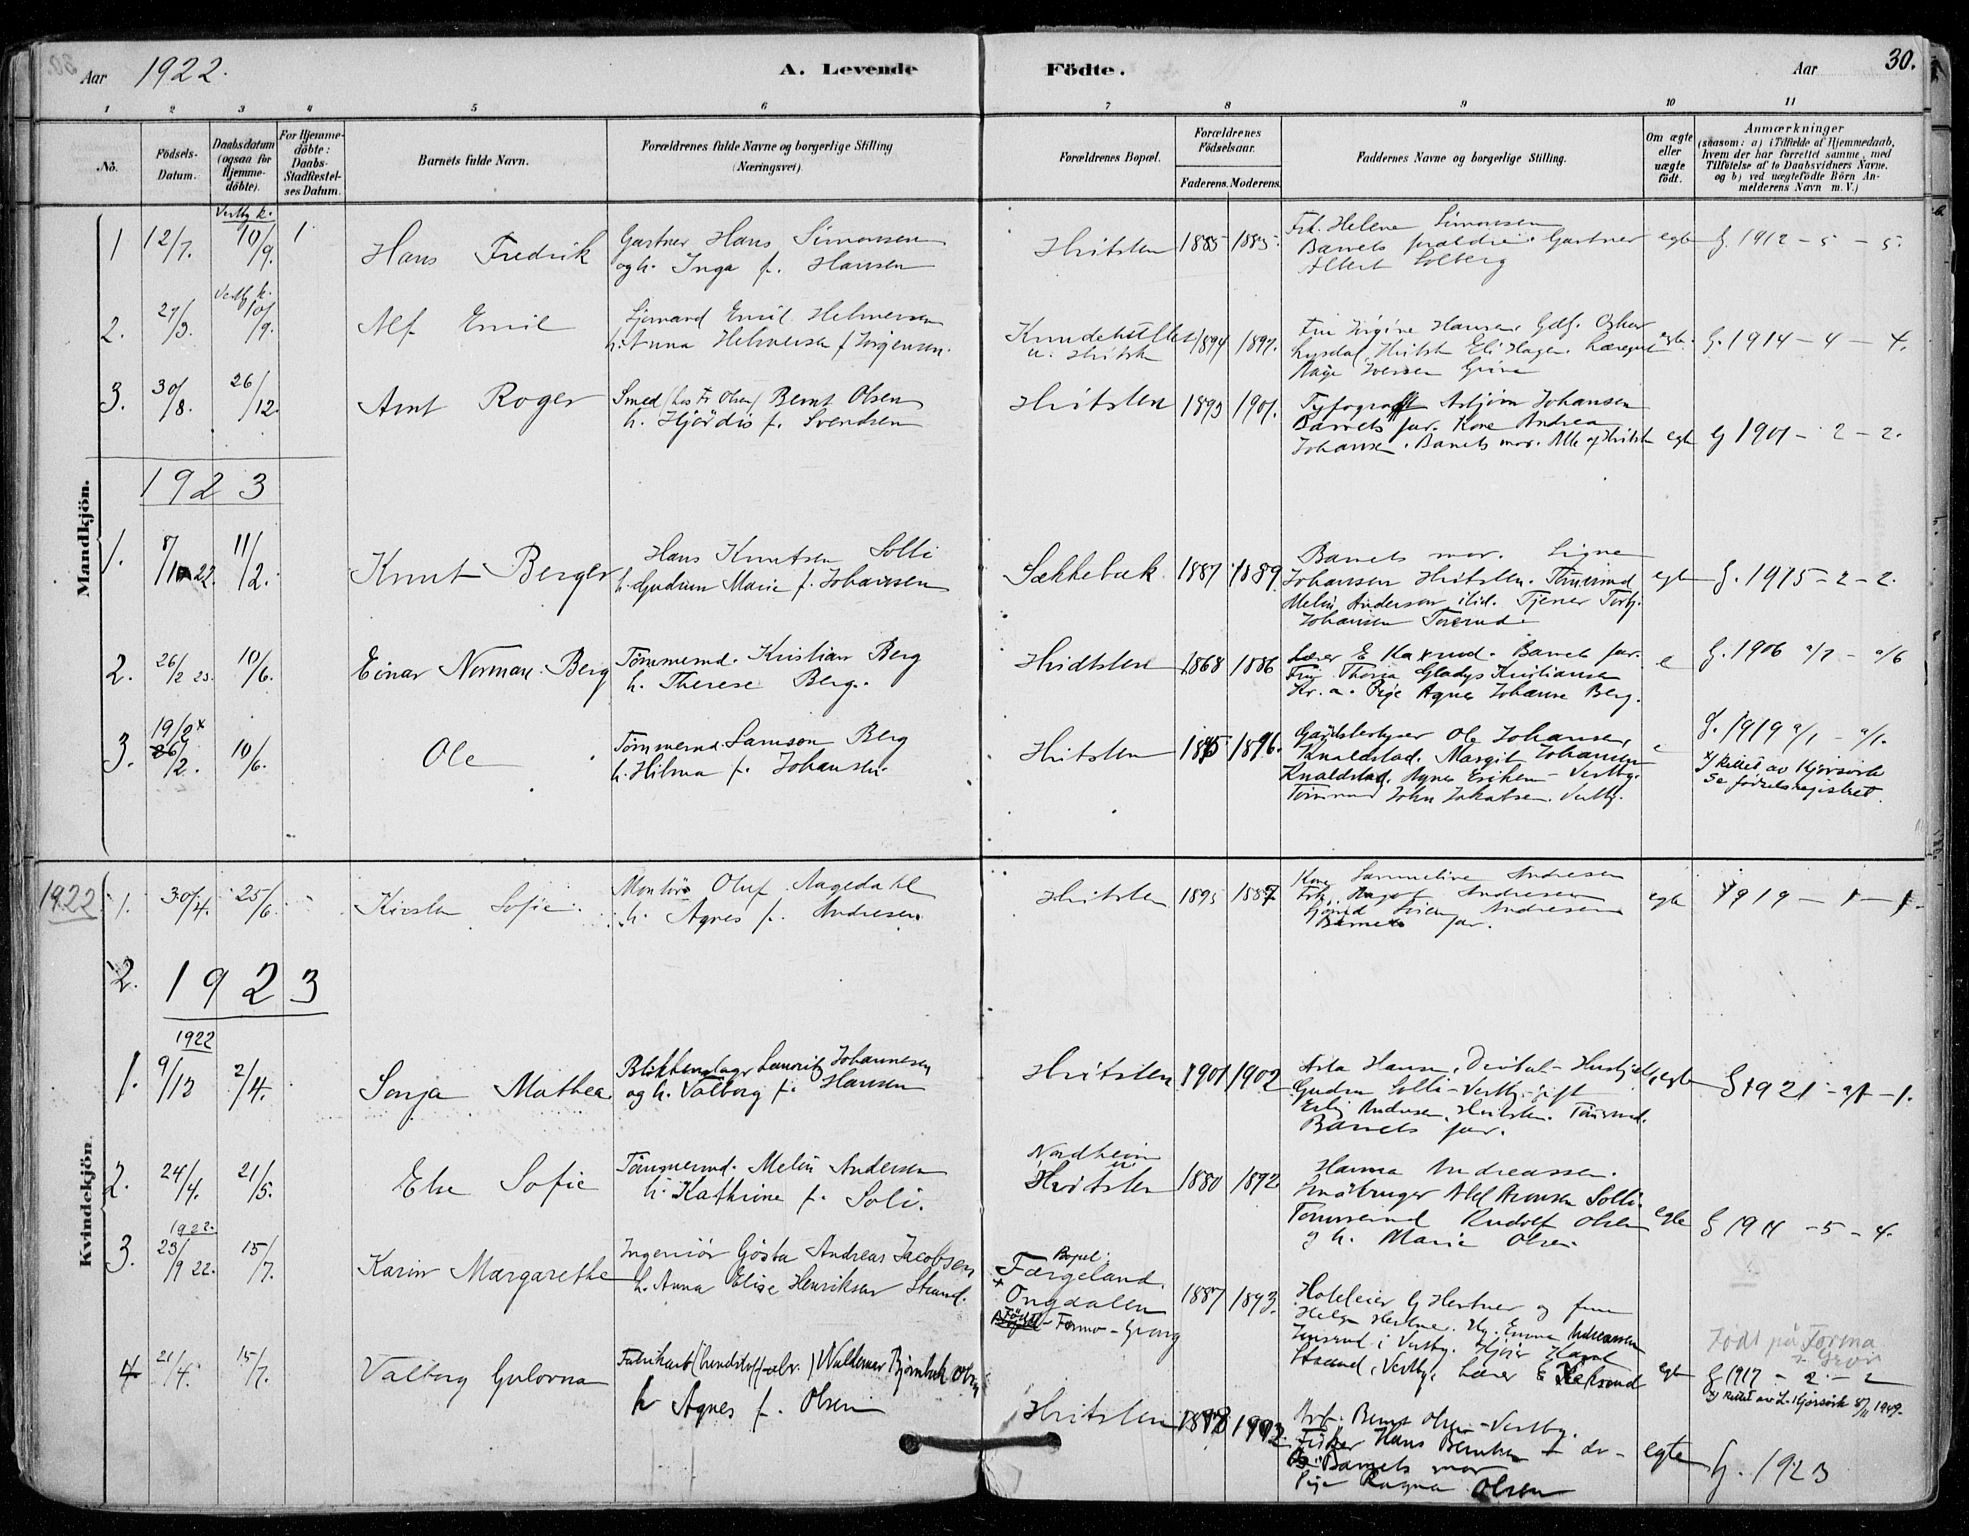 SAO, Vestby prestekontor Kirkebøker, F/Fd/L0001: Ministerialbok nr. IV 1, 1878-1945, s. 30